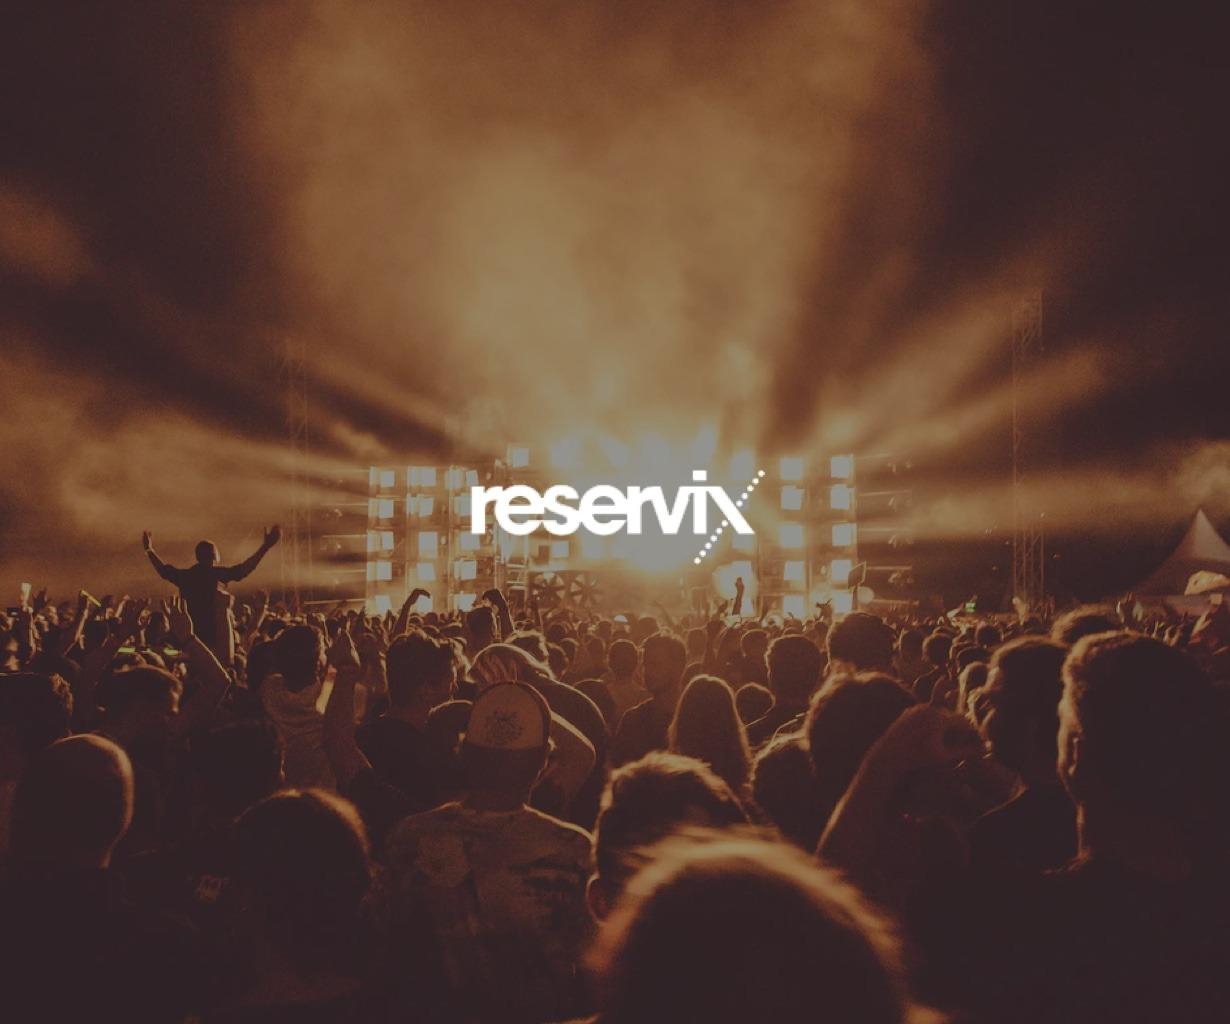 reservix portfolio cover